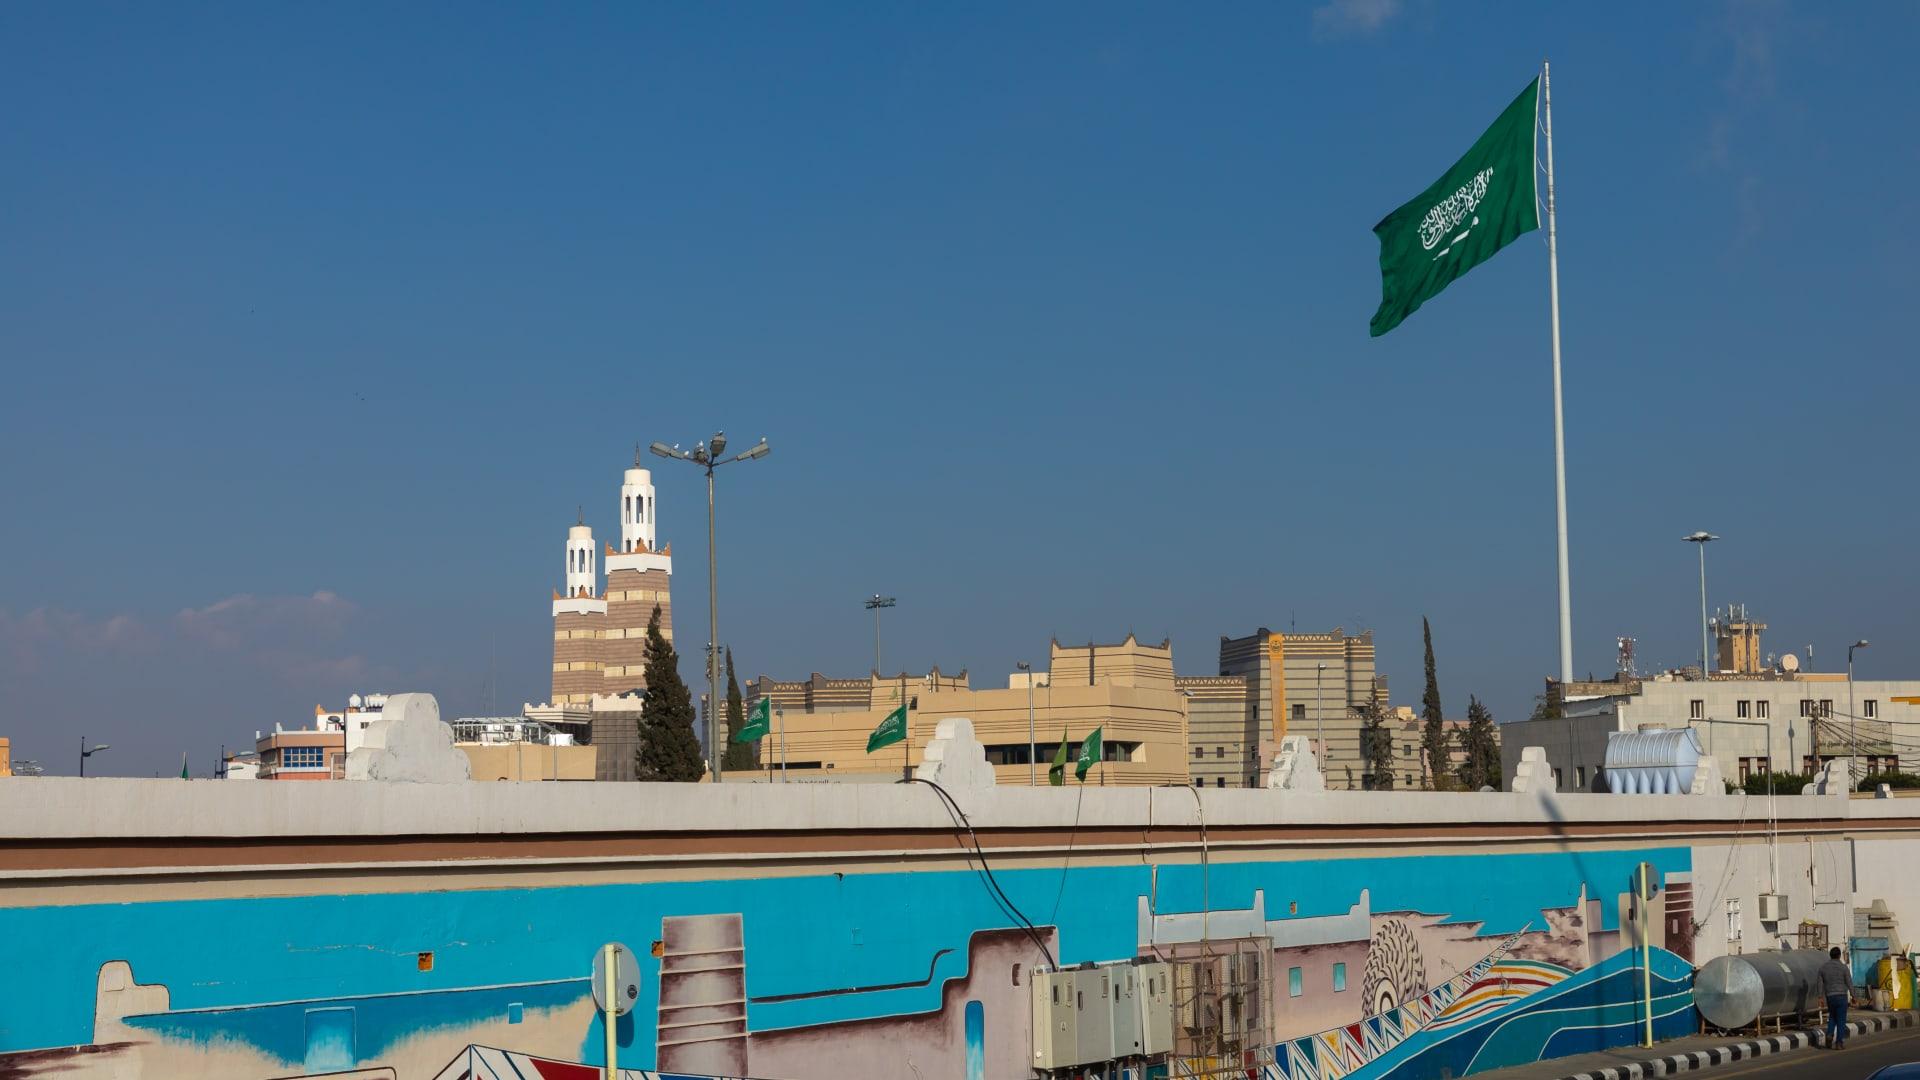 Saudi arabian flag in Asir province, Abha, Saudi Arabia.